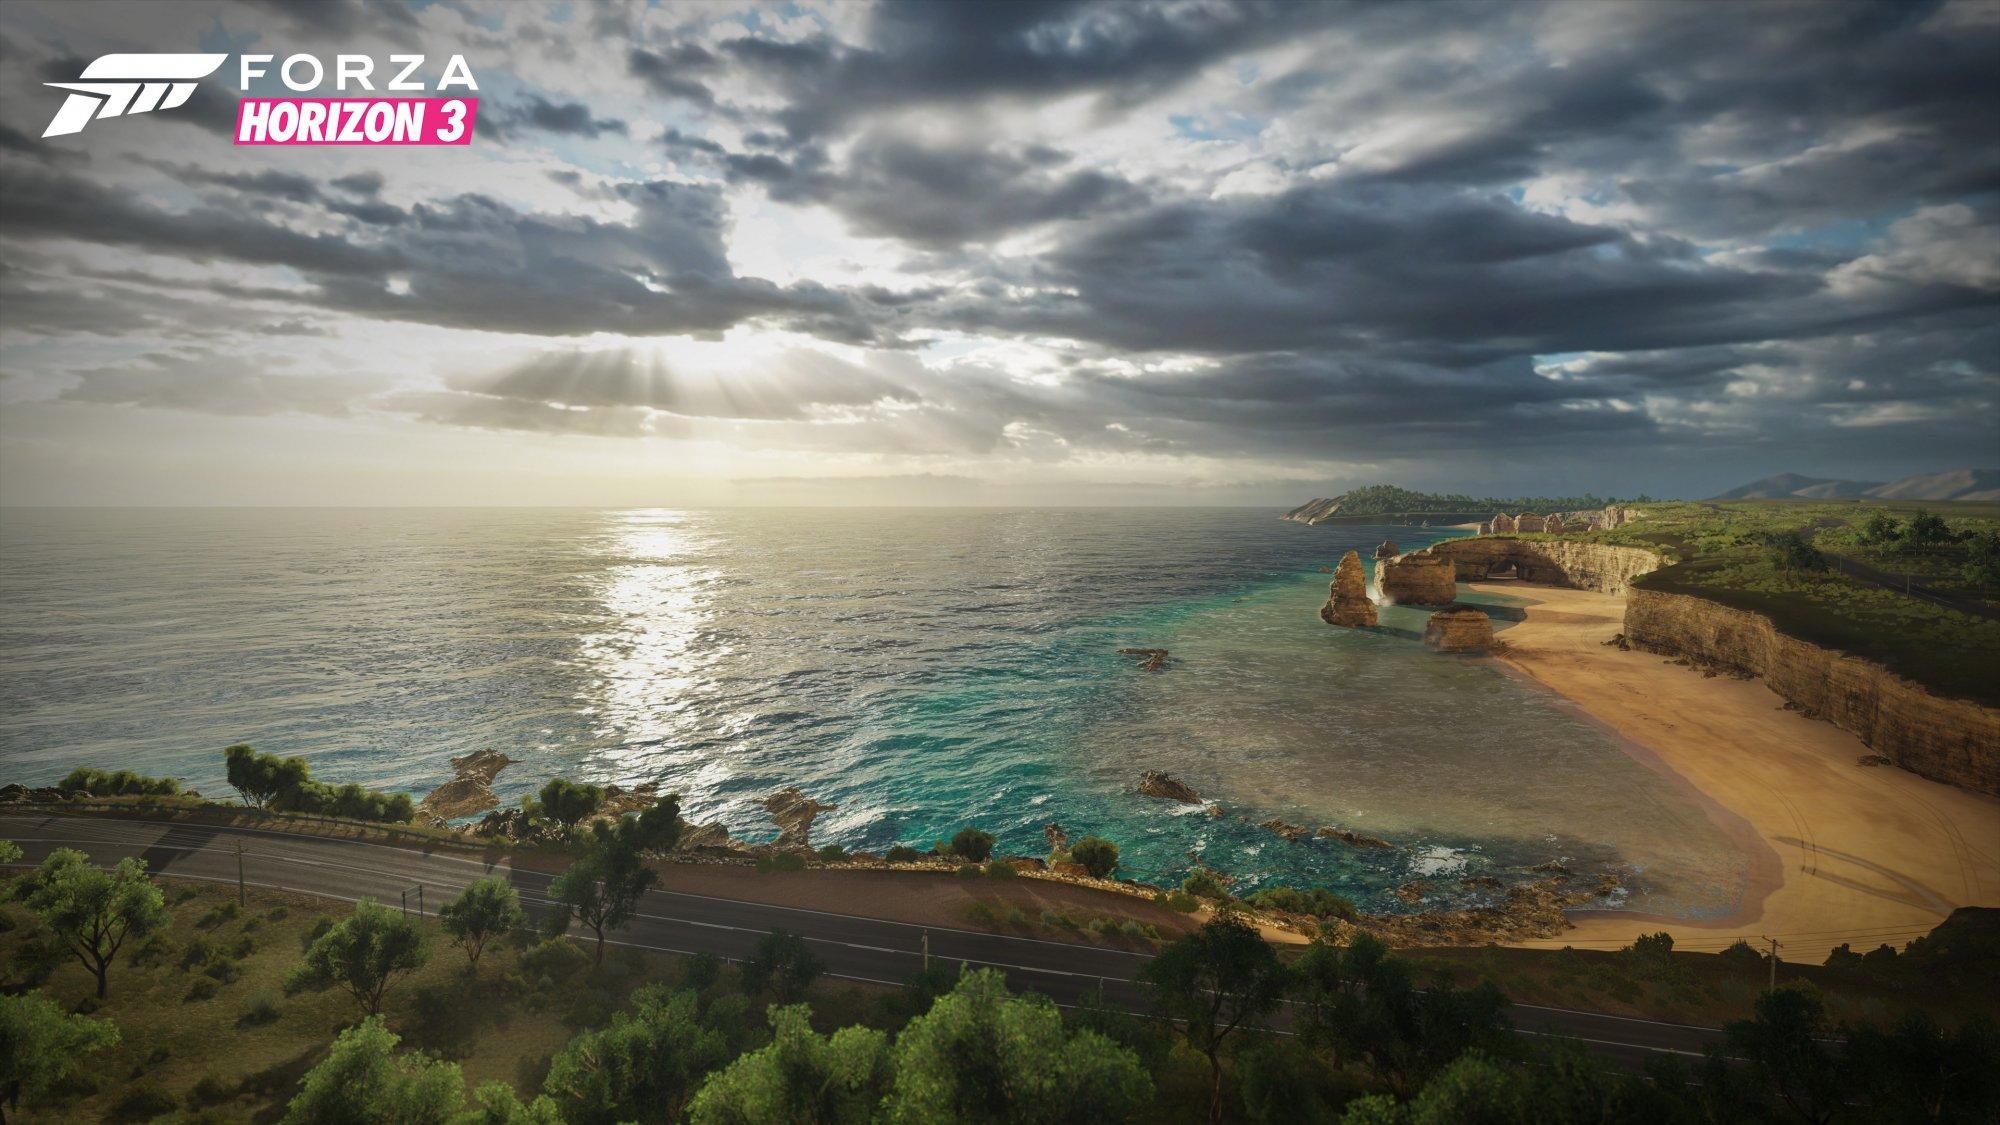 ForzaHorizon3_E3PressKit_CoastLandscape_WM